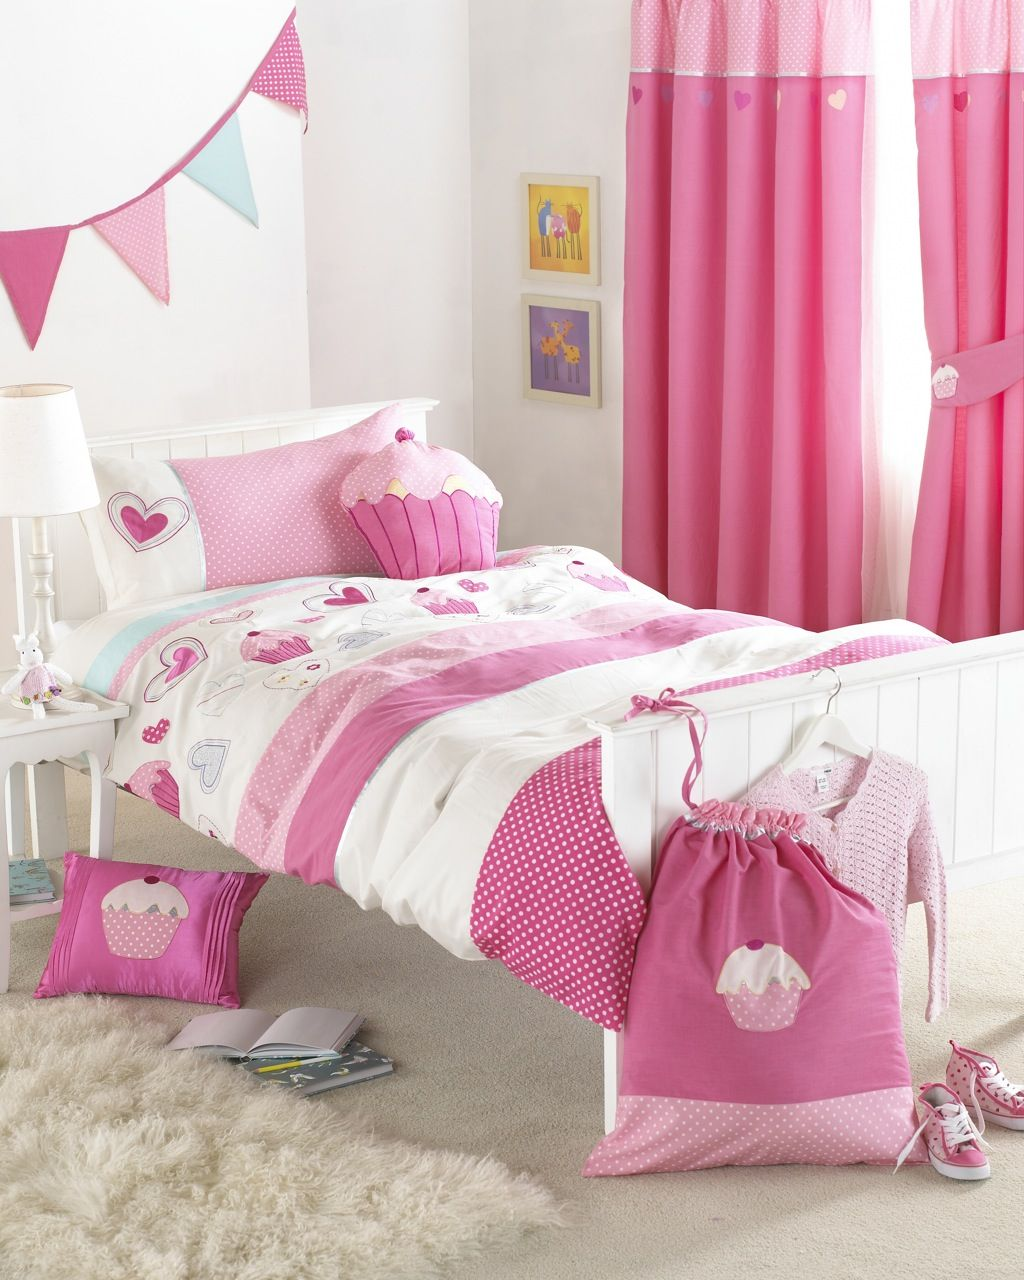 Modelos de cortinas cortinas para cuartos cortinas - Modelos de dormitorios juveniles ...